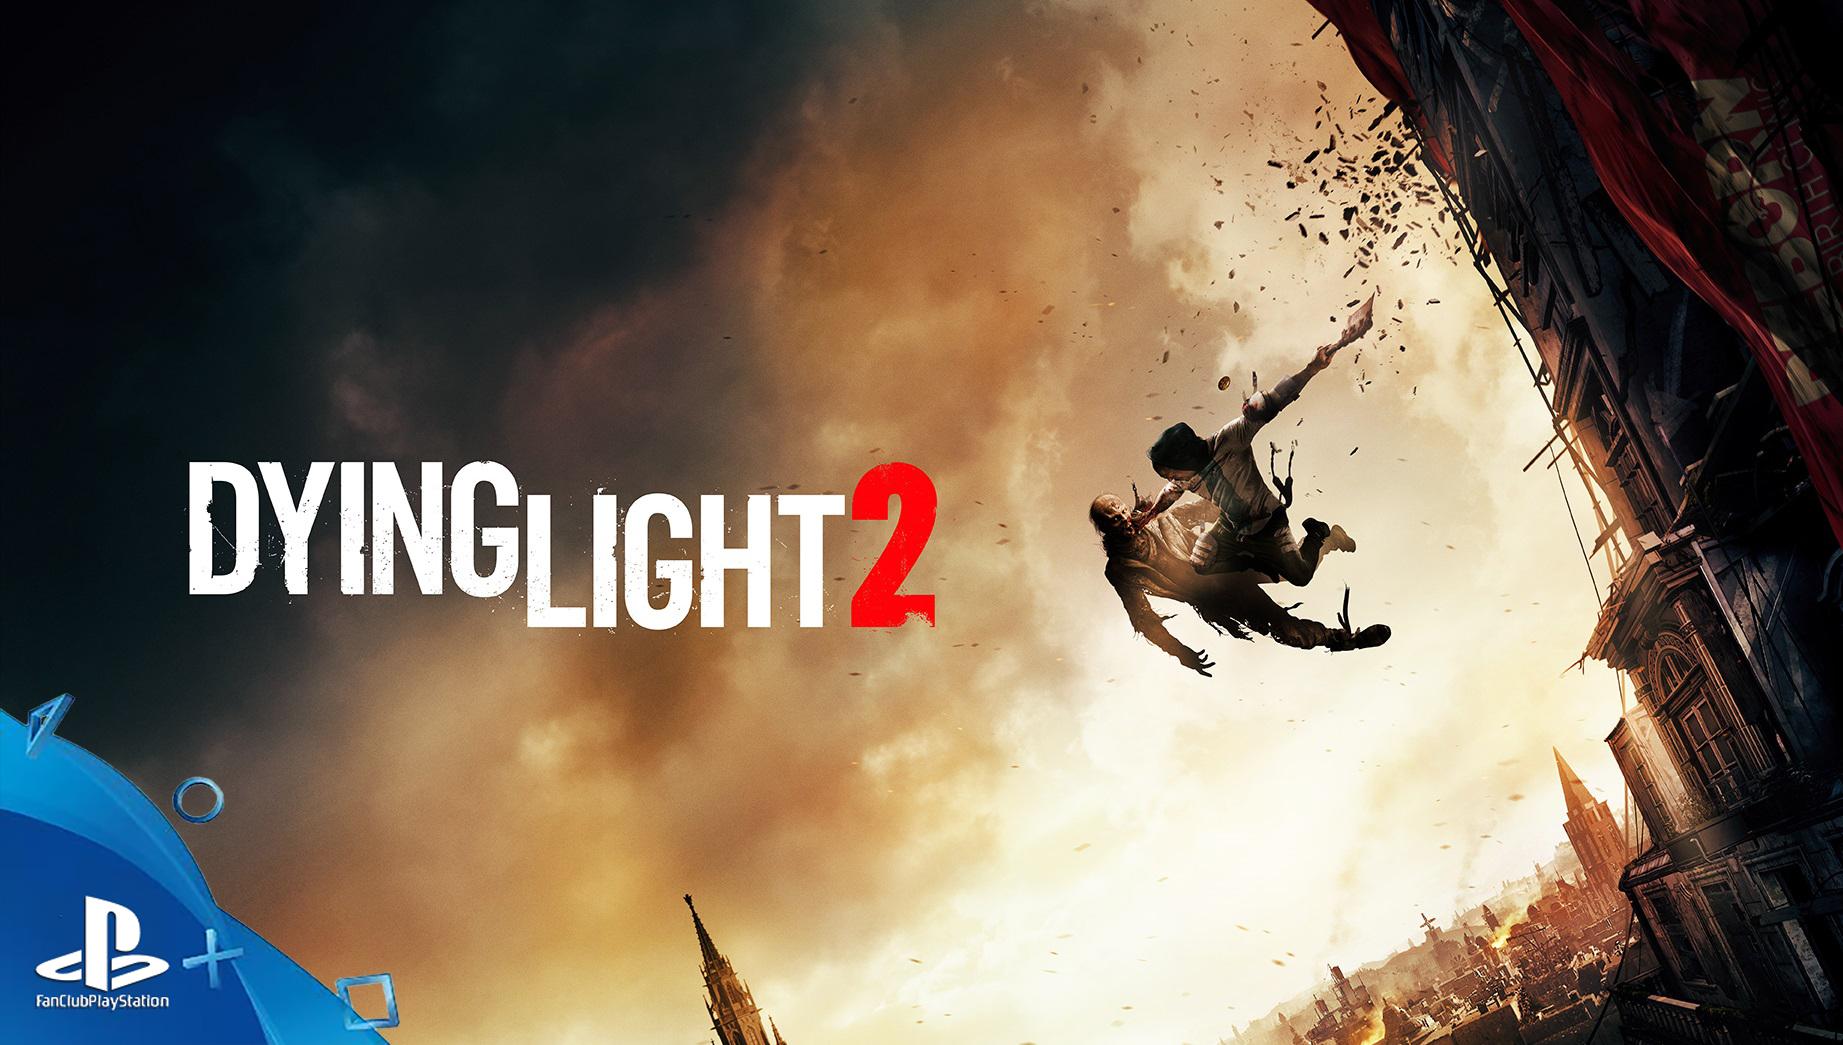 dying-light-2-1-2 copy